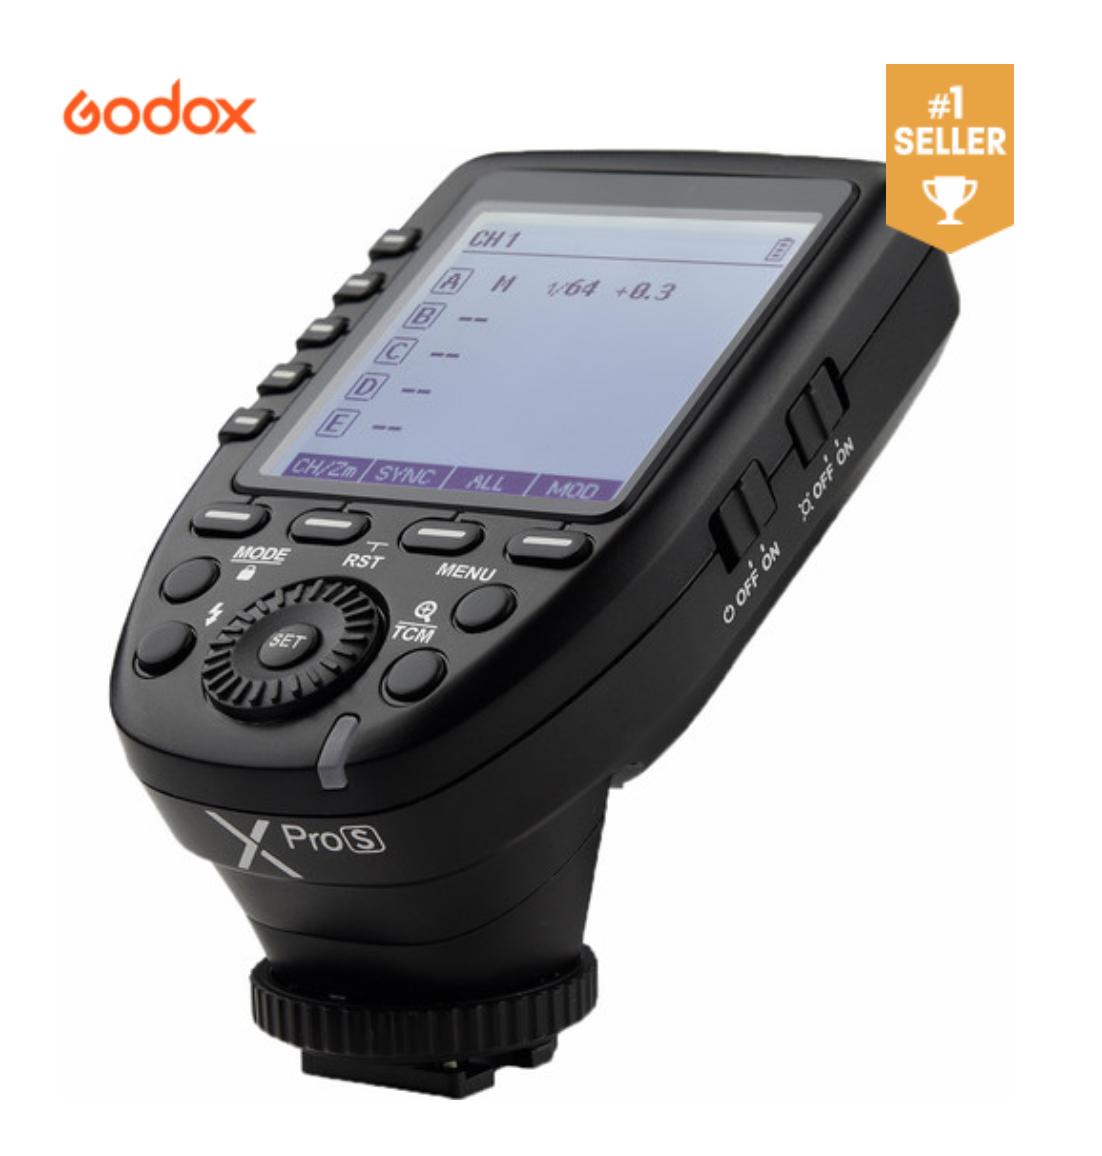 Godox XProS TTL Wireless Flash Trigger - Triggers any flash in the system, on-camera, off-camera, studio strobe etc… Brilliant!